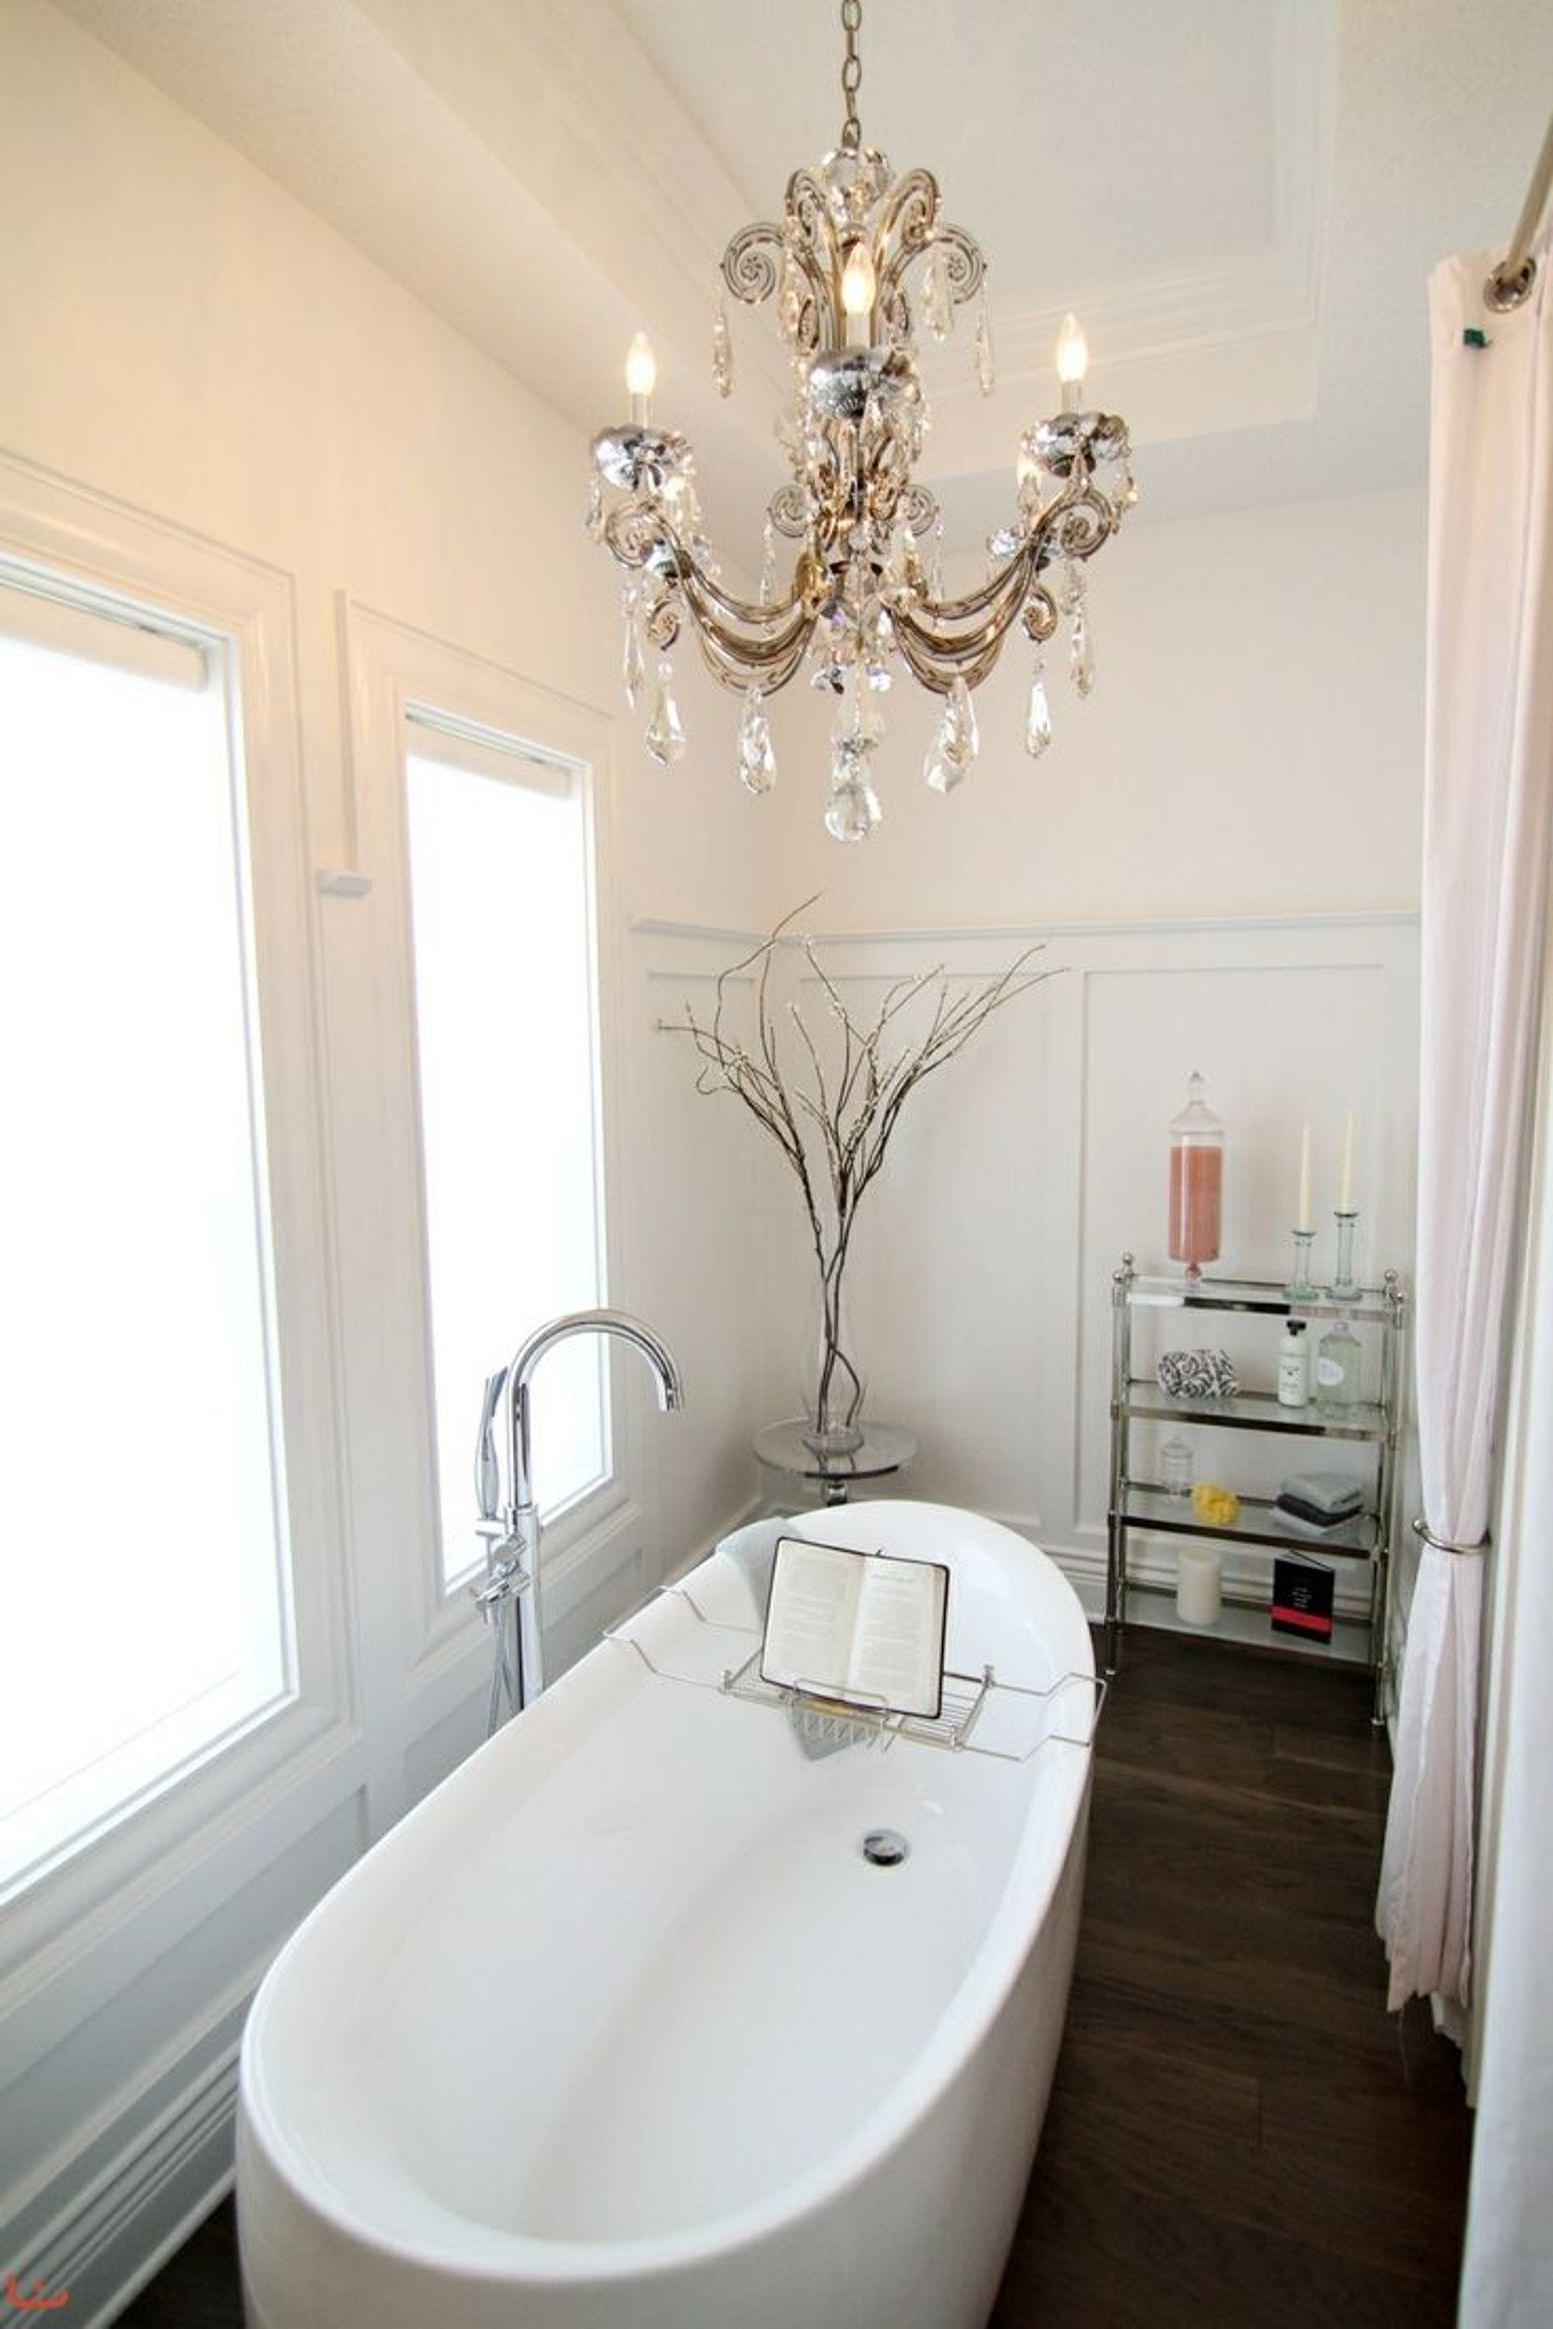 Mini Bathroom Chandeliers In Favorite Chandeliers : Mini Chandelier For Bathroom Unique Decoration In (View 19 of 20)